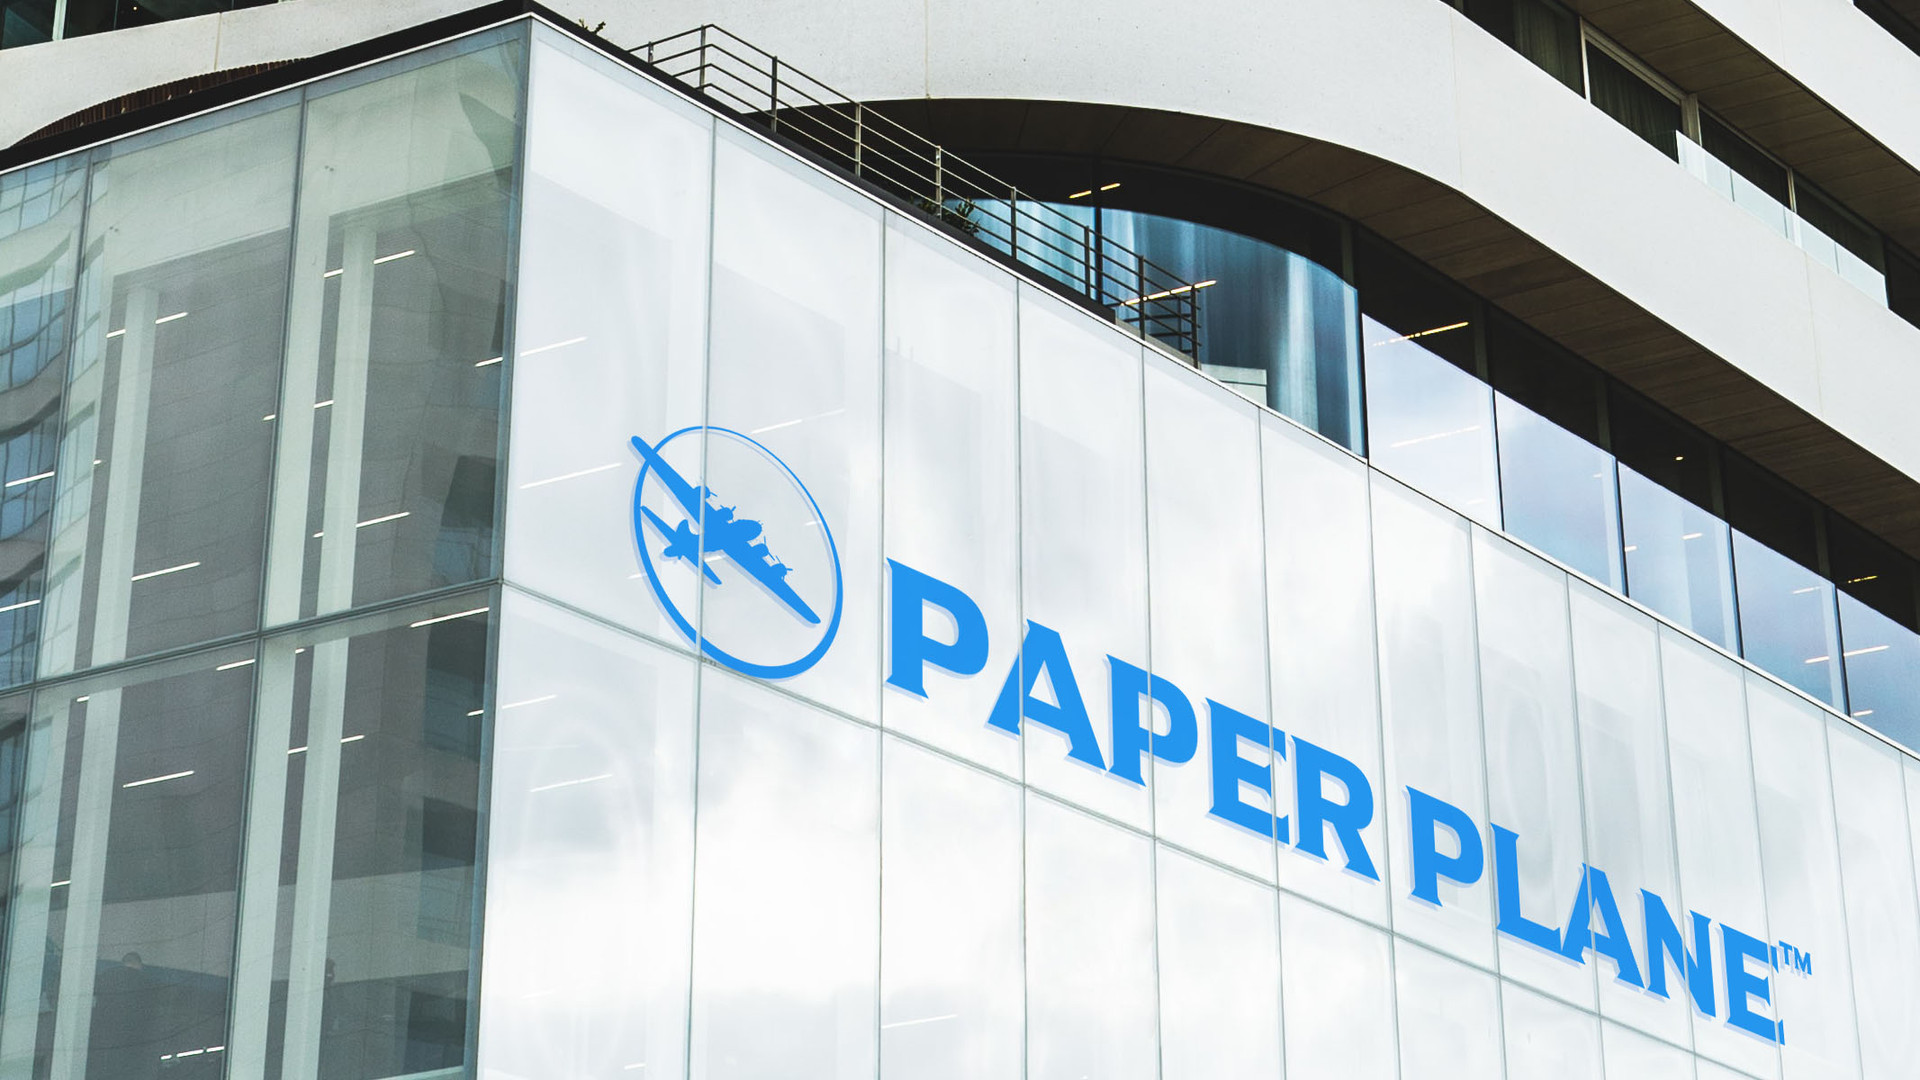 Paper Plane Headquarters